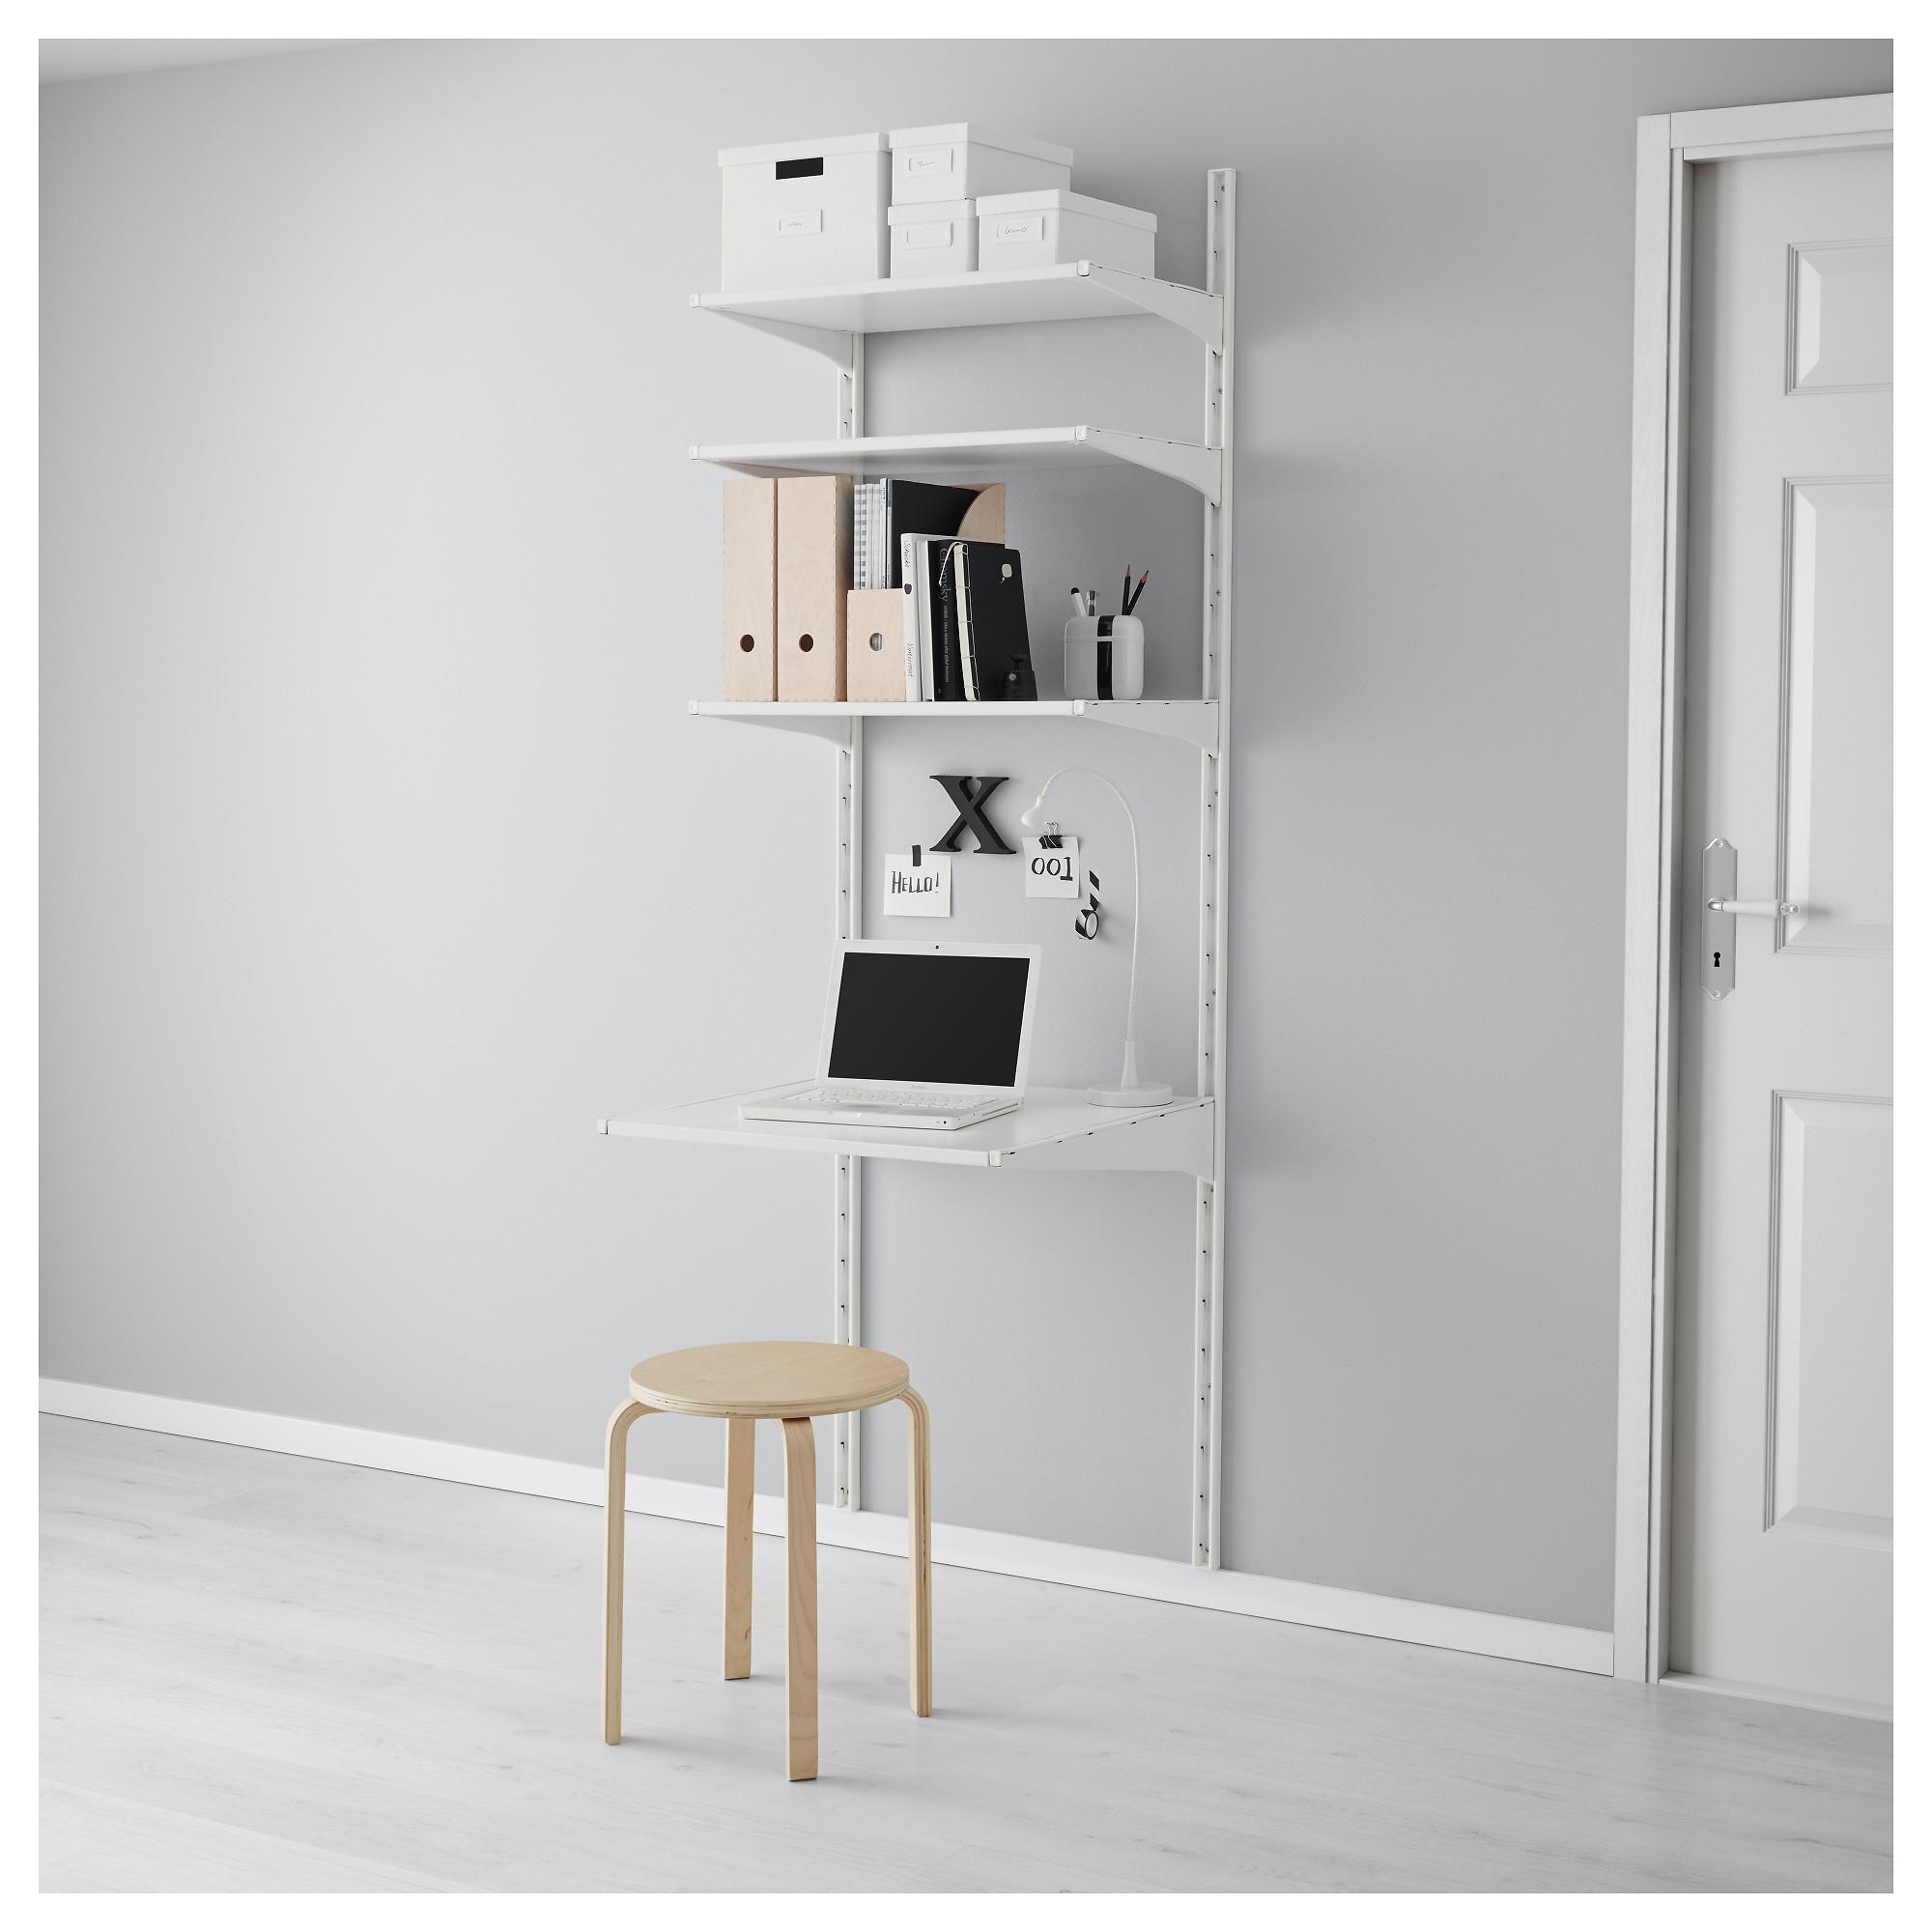 Rieles Para Colgar Cuadros Ikea Awesome Ikea Best Mueble Tv Con  ~ Colgar Cuadros Sin Agujeros Ikea